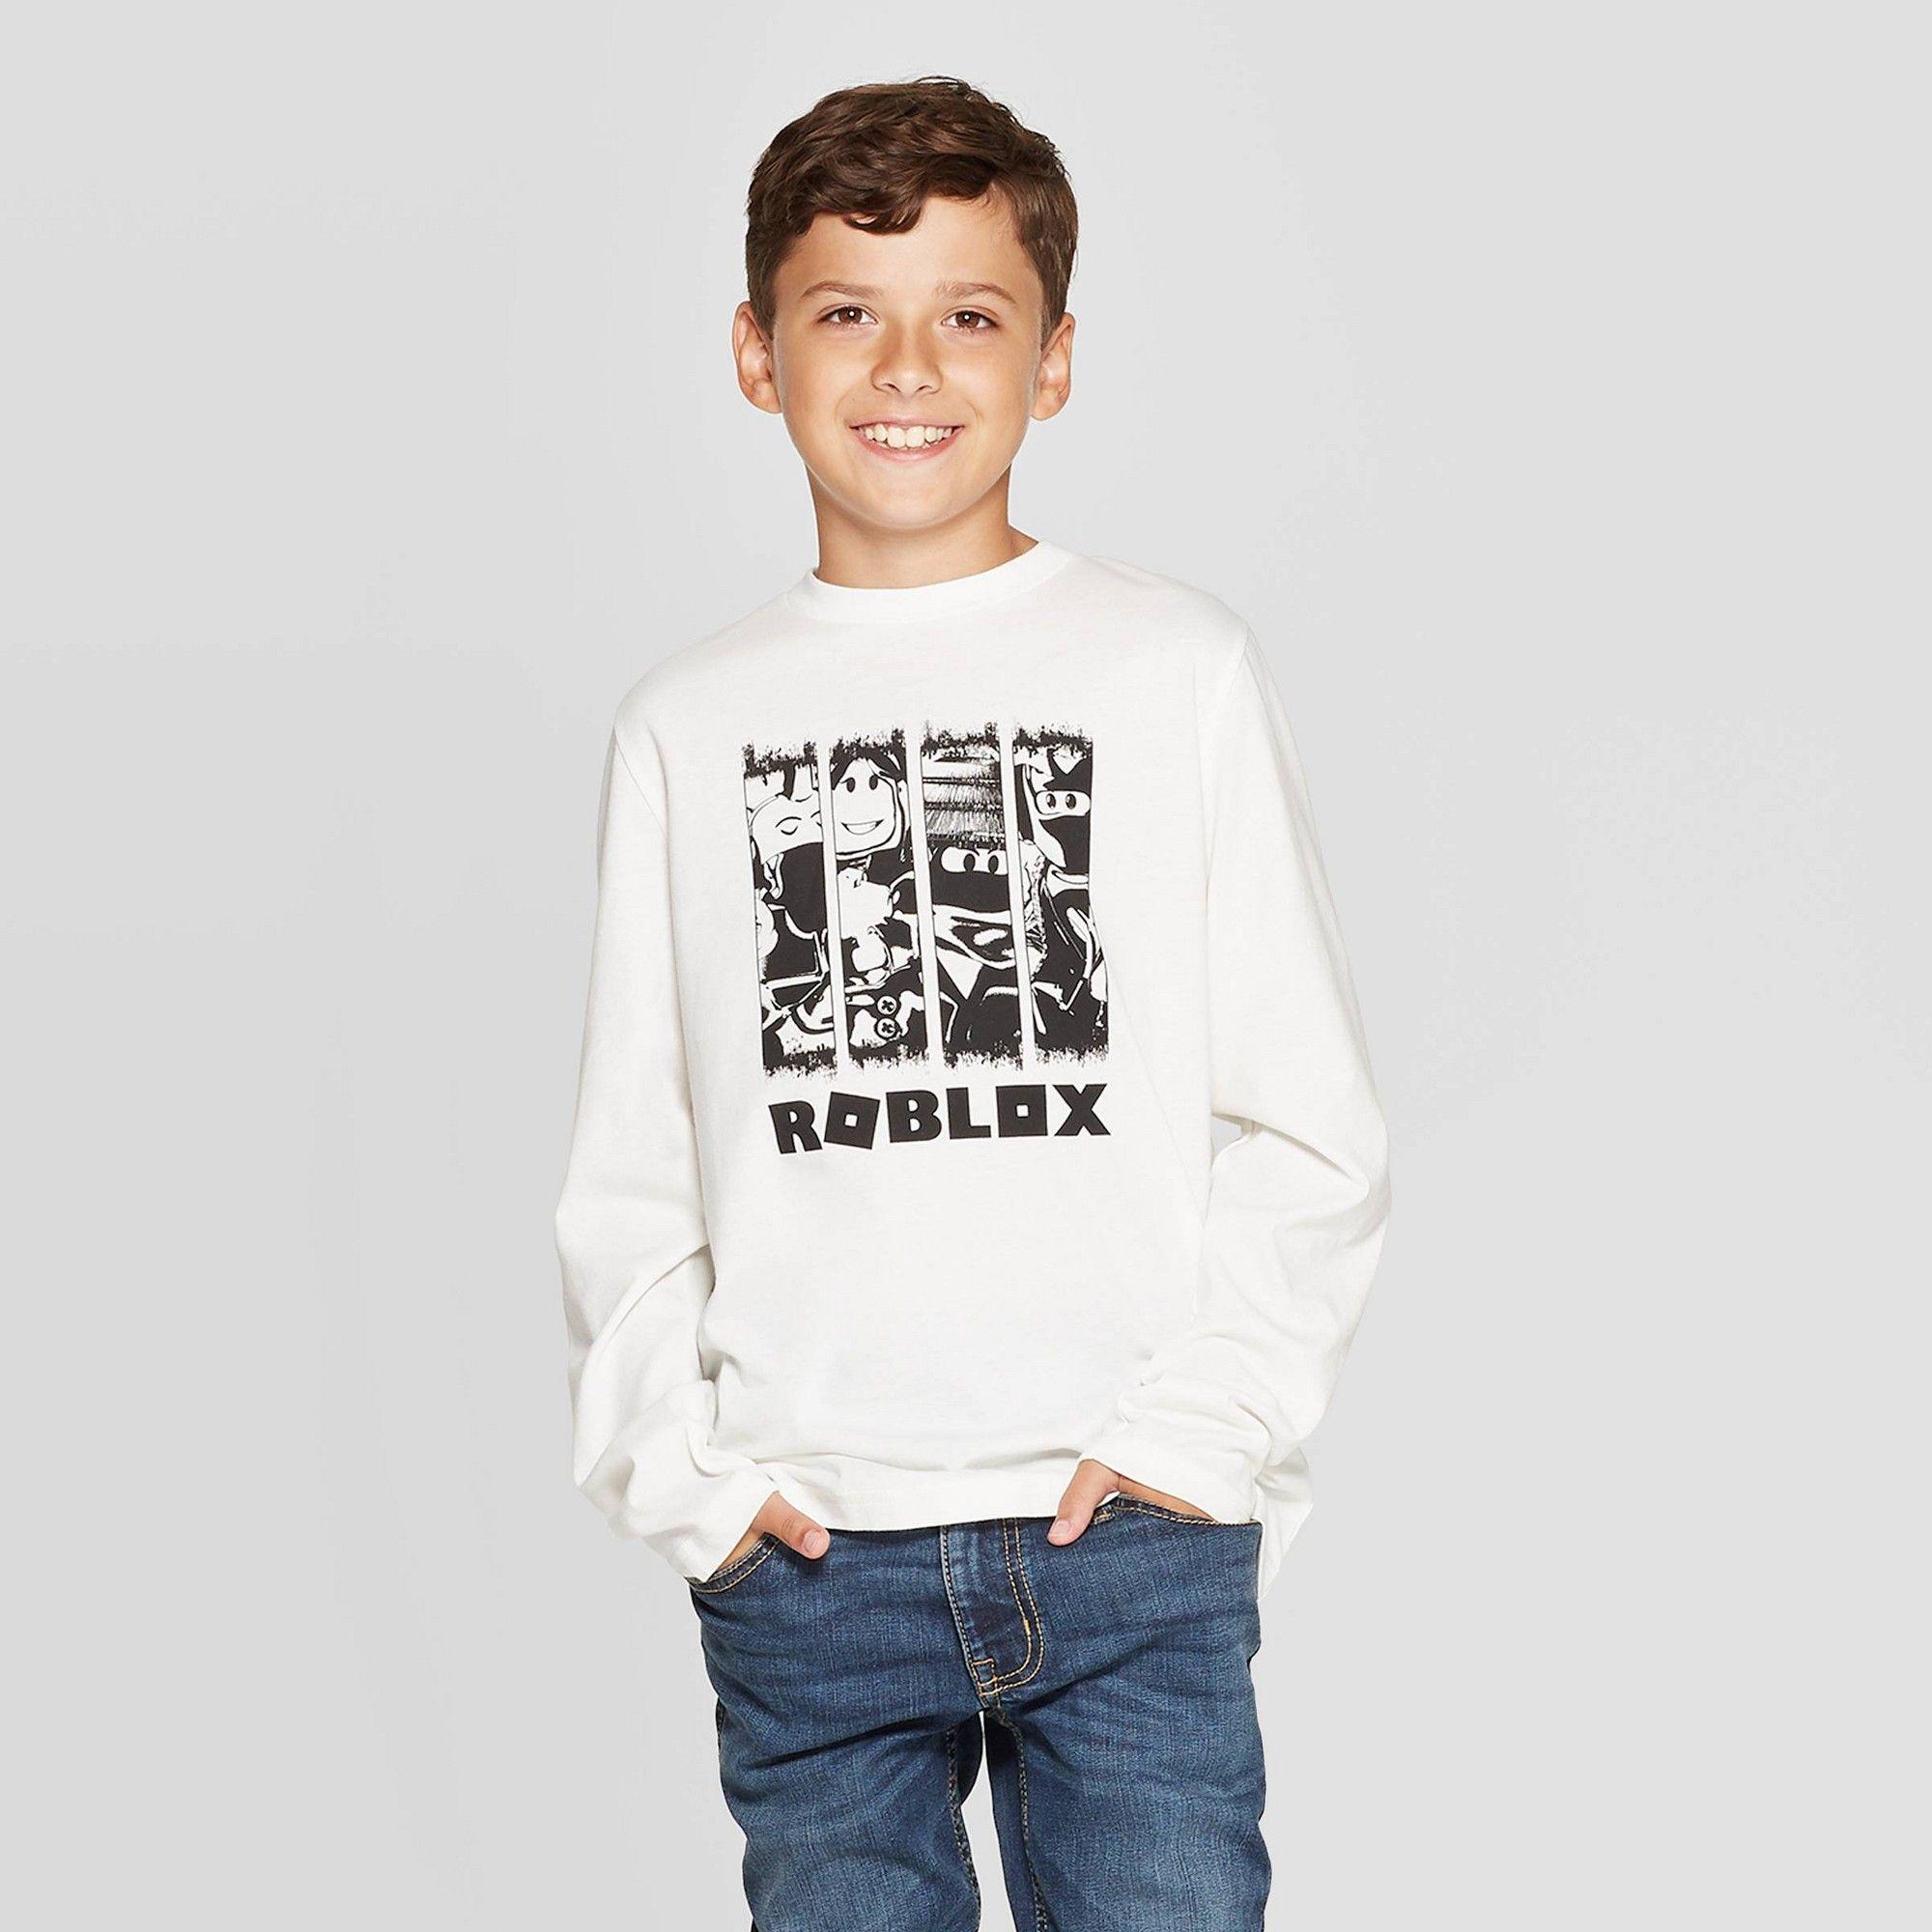 Boys Roblox Long Sleeve T Shirt White Xl Boy S White Long Sleeve Shirts White Shirts Blue [ 2000 x 2000 Pixel ]